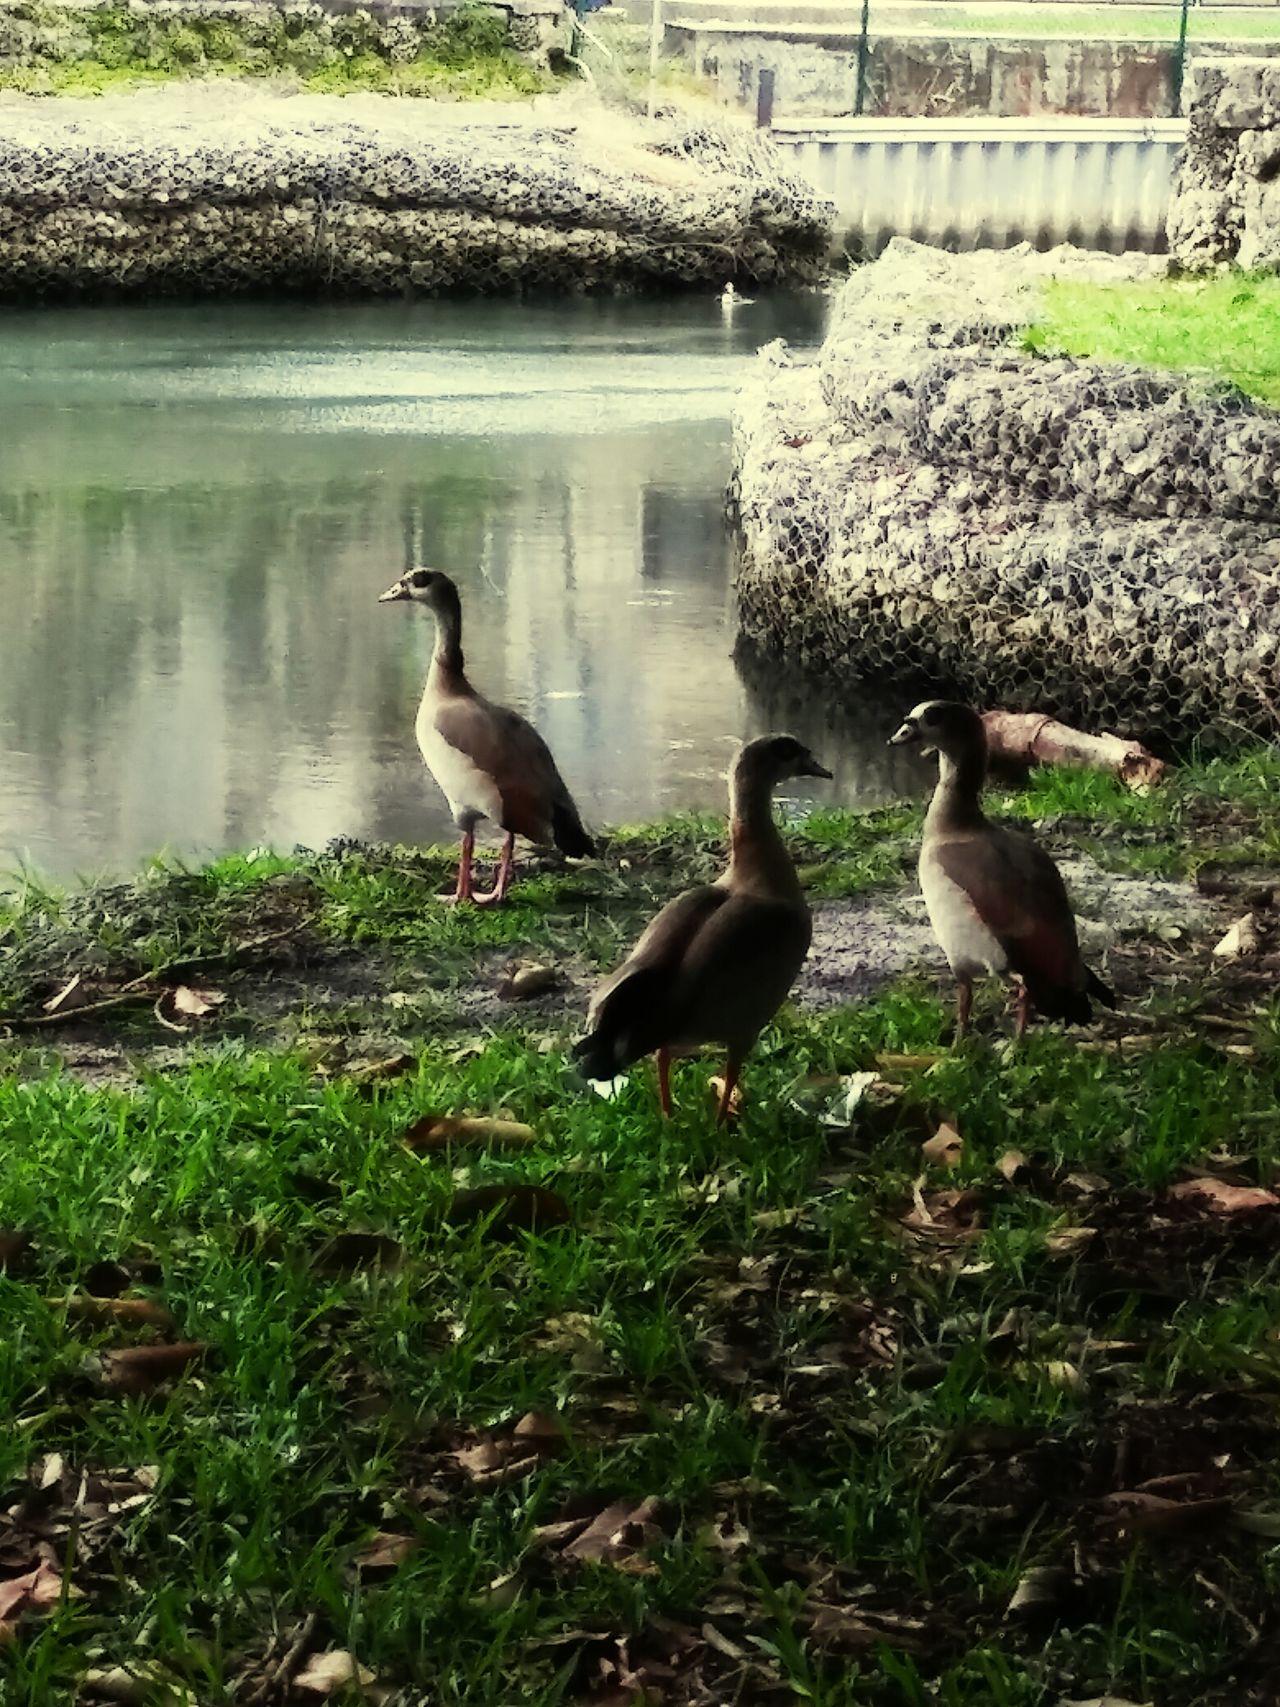 Bird Photography Canals And Waterways Taking Photos Natur!! Girlskick